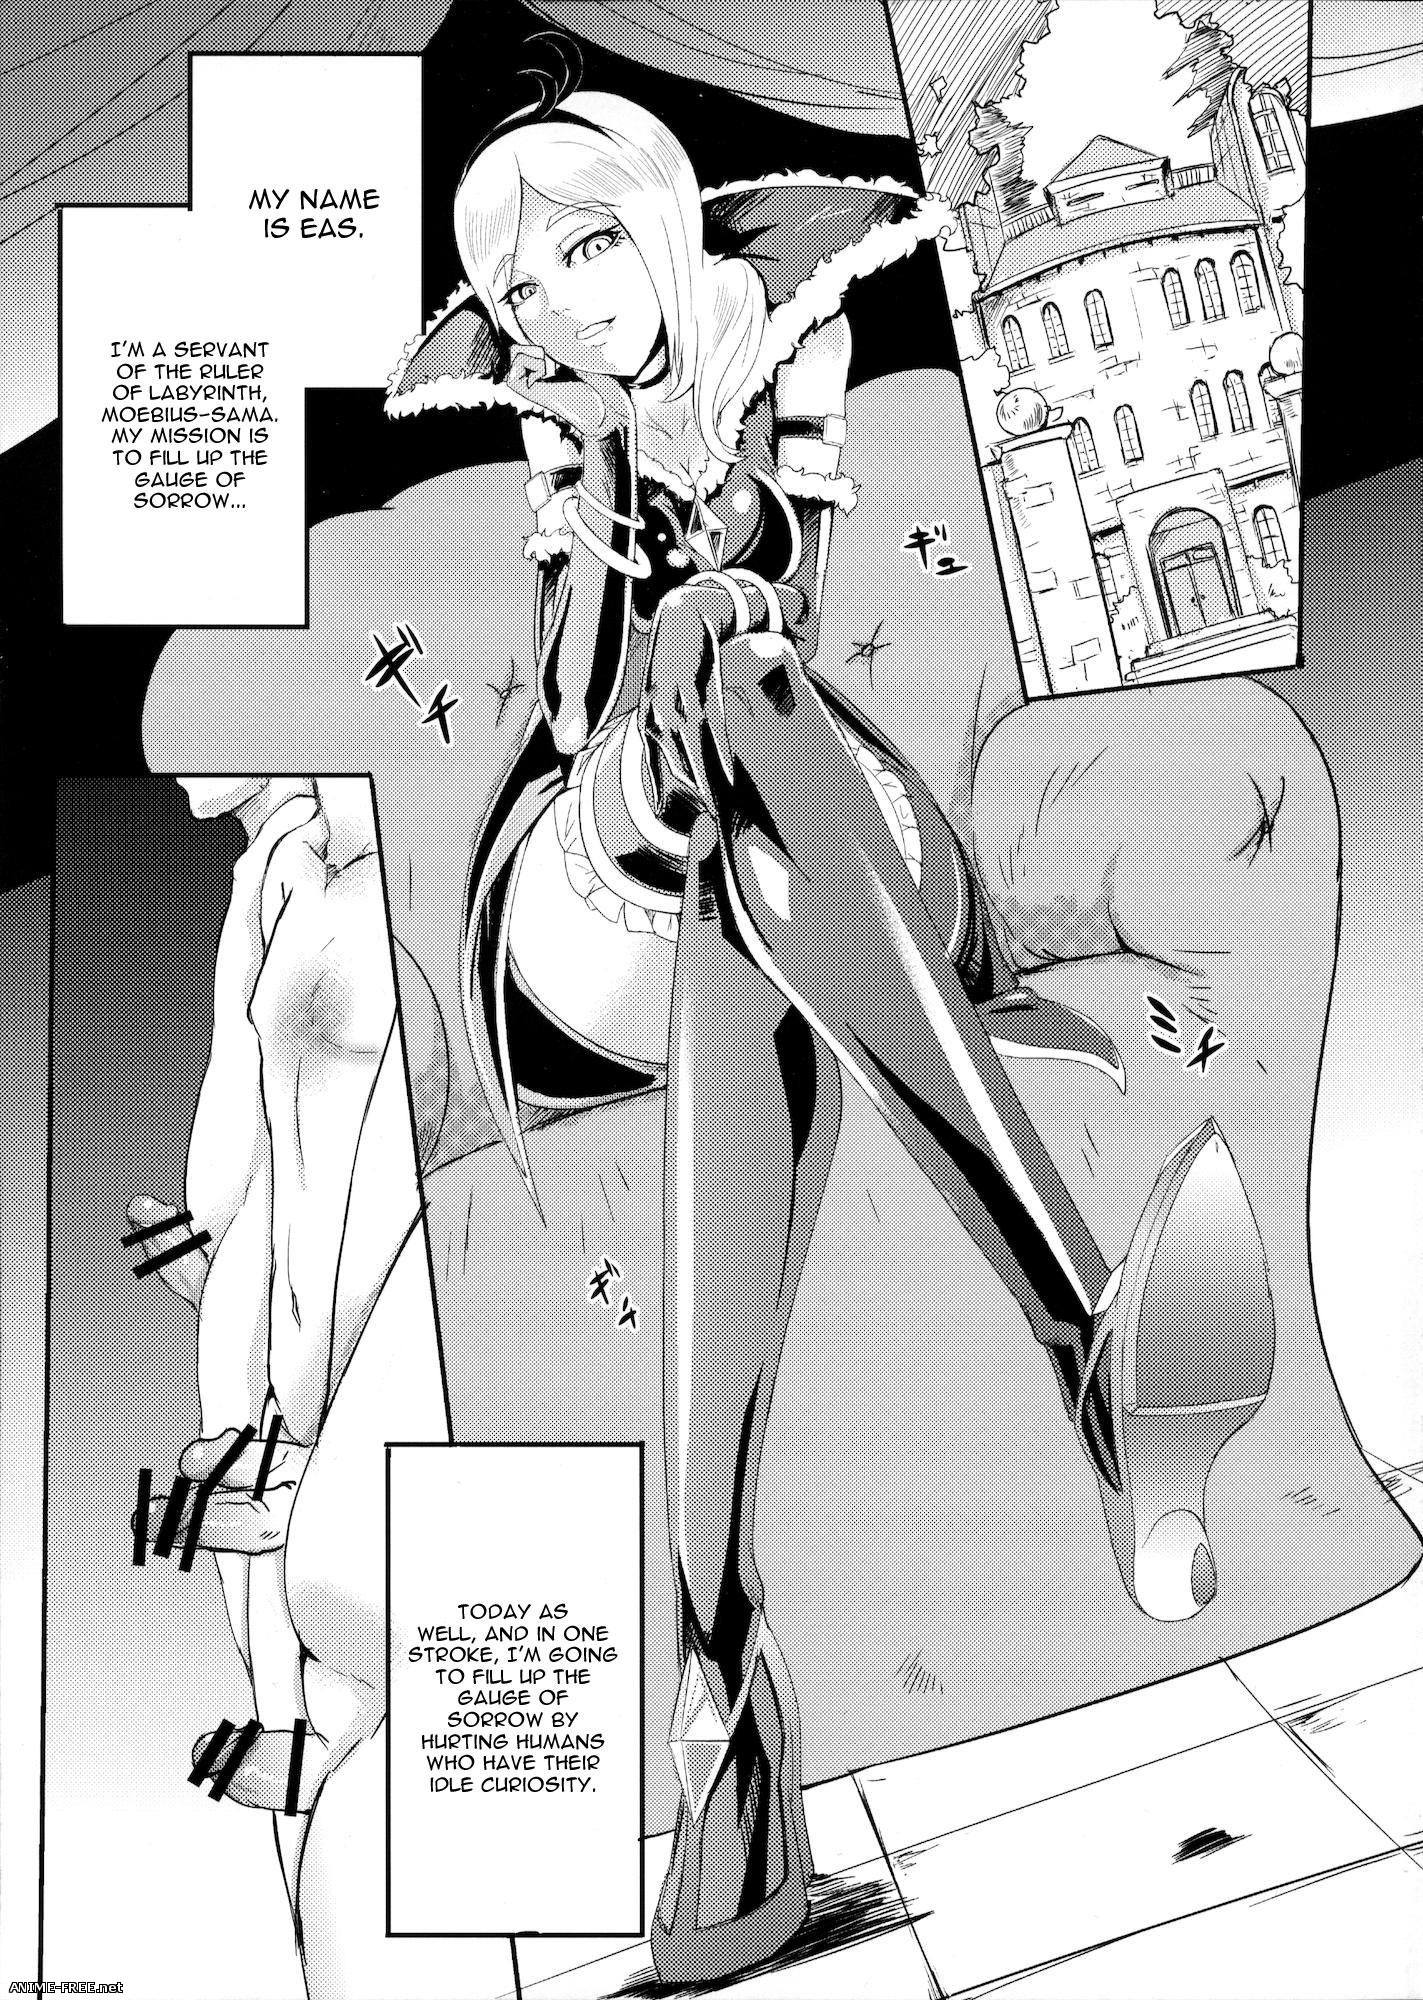 Otochichi (cir.SOUND MILK) - Сборник хентай манги [Ptcen] [JAP,ENG,RUS] Manga Hentai